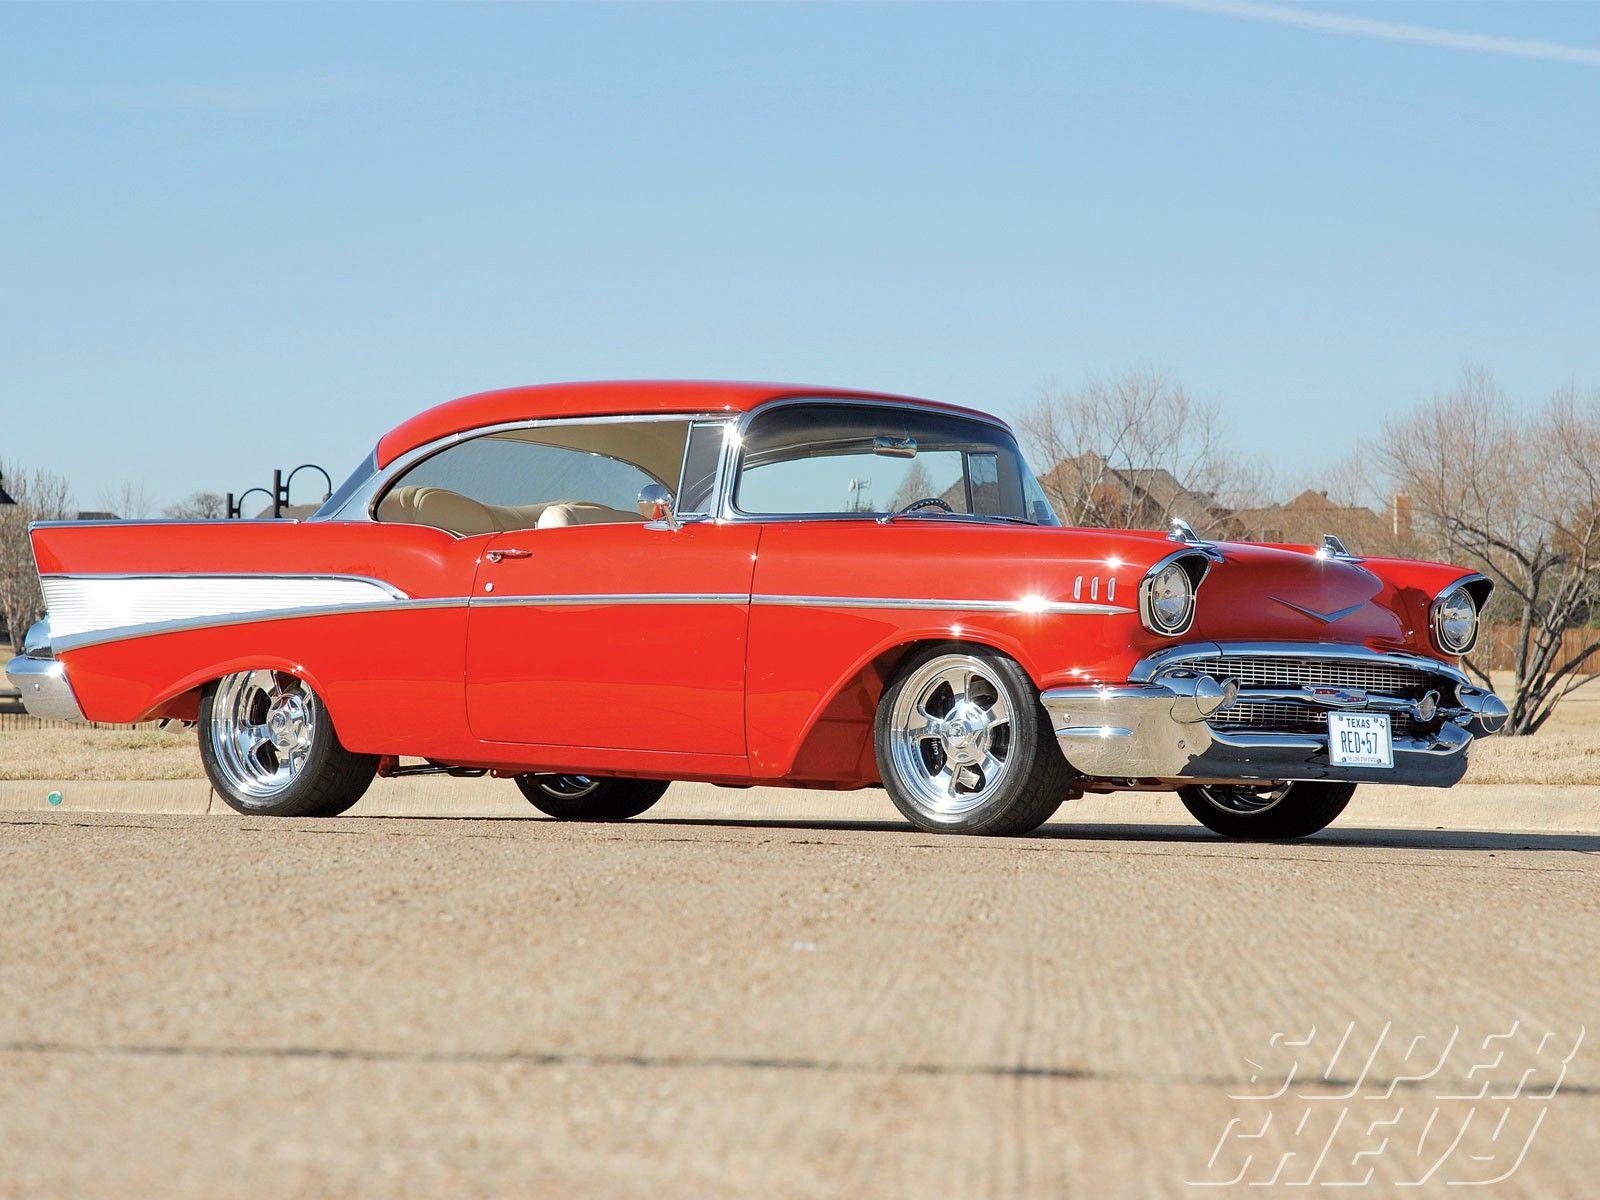 The Classic 1957 Chevy Bel Air. I wonder if it's original designer knew that thi…